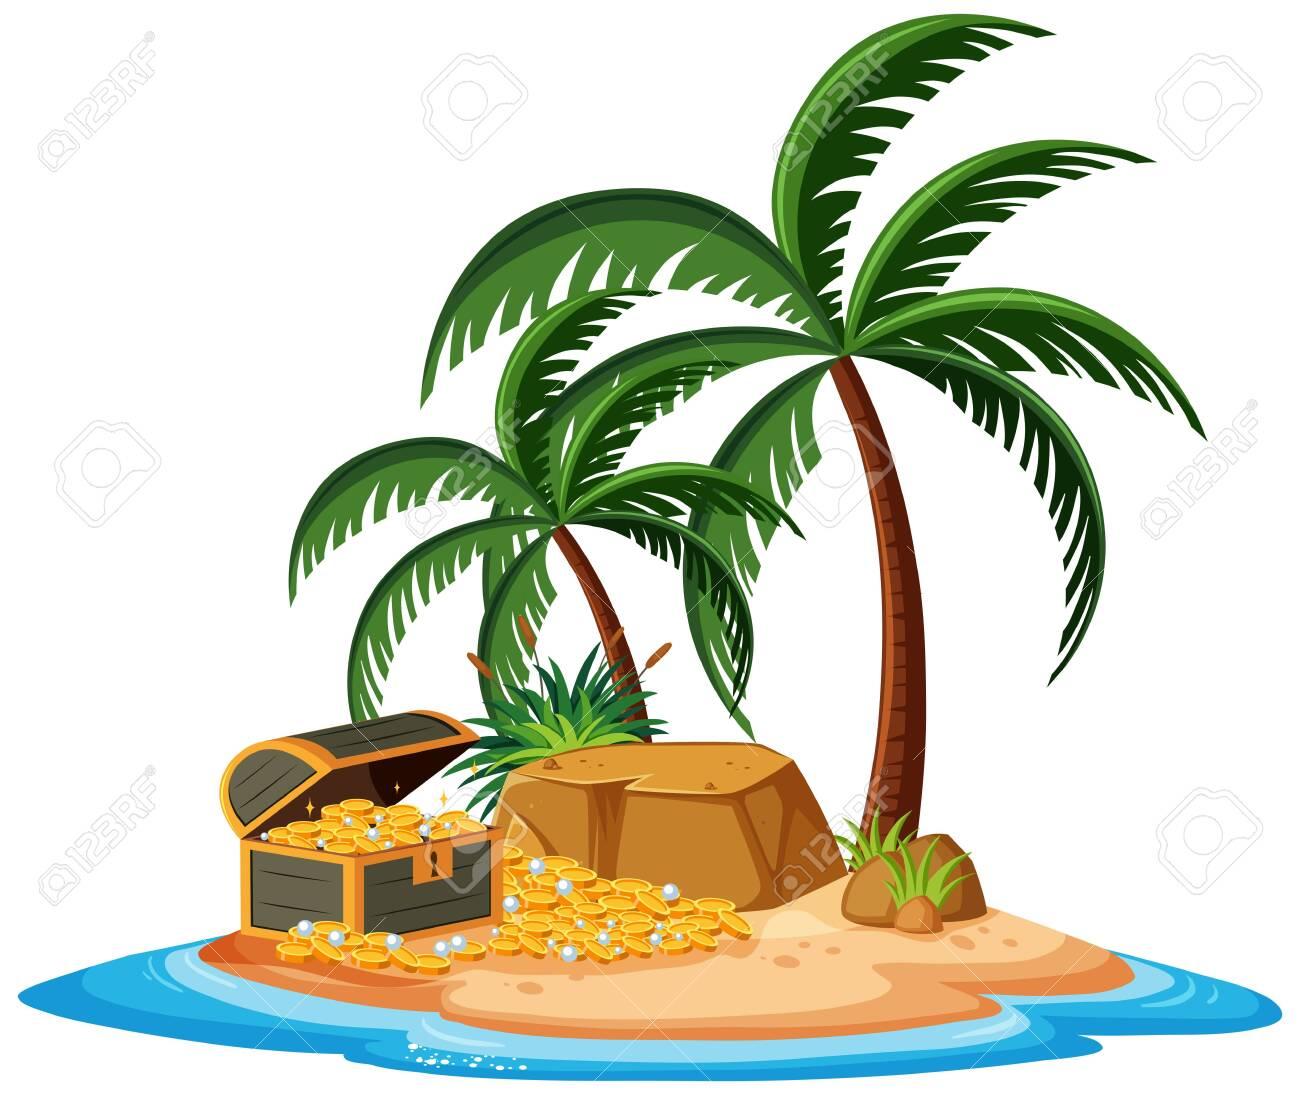 A treasure island on white background illustration - 123688066